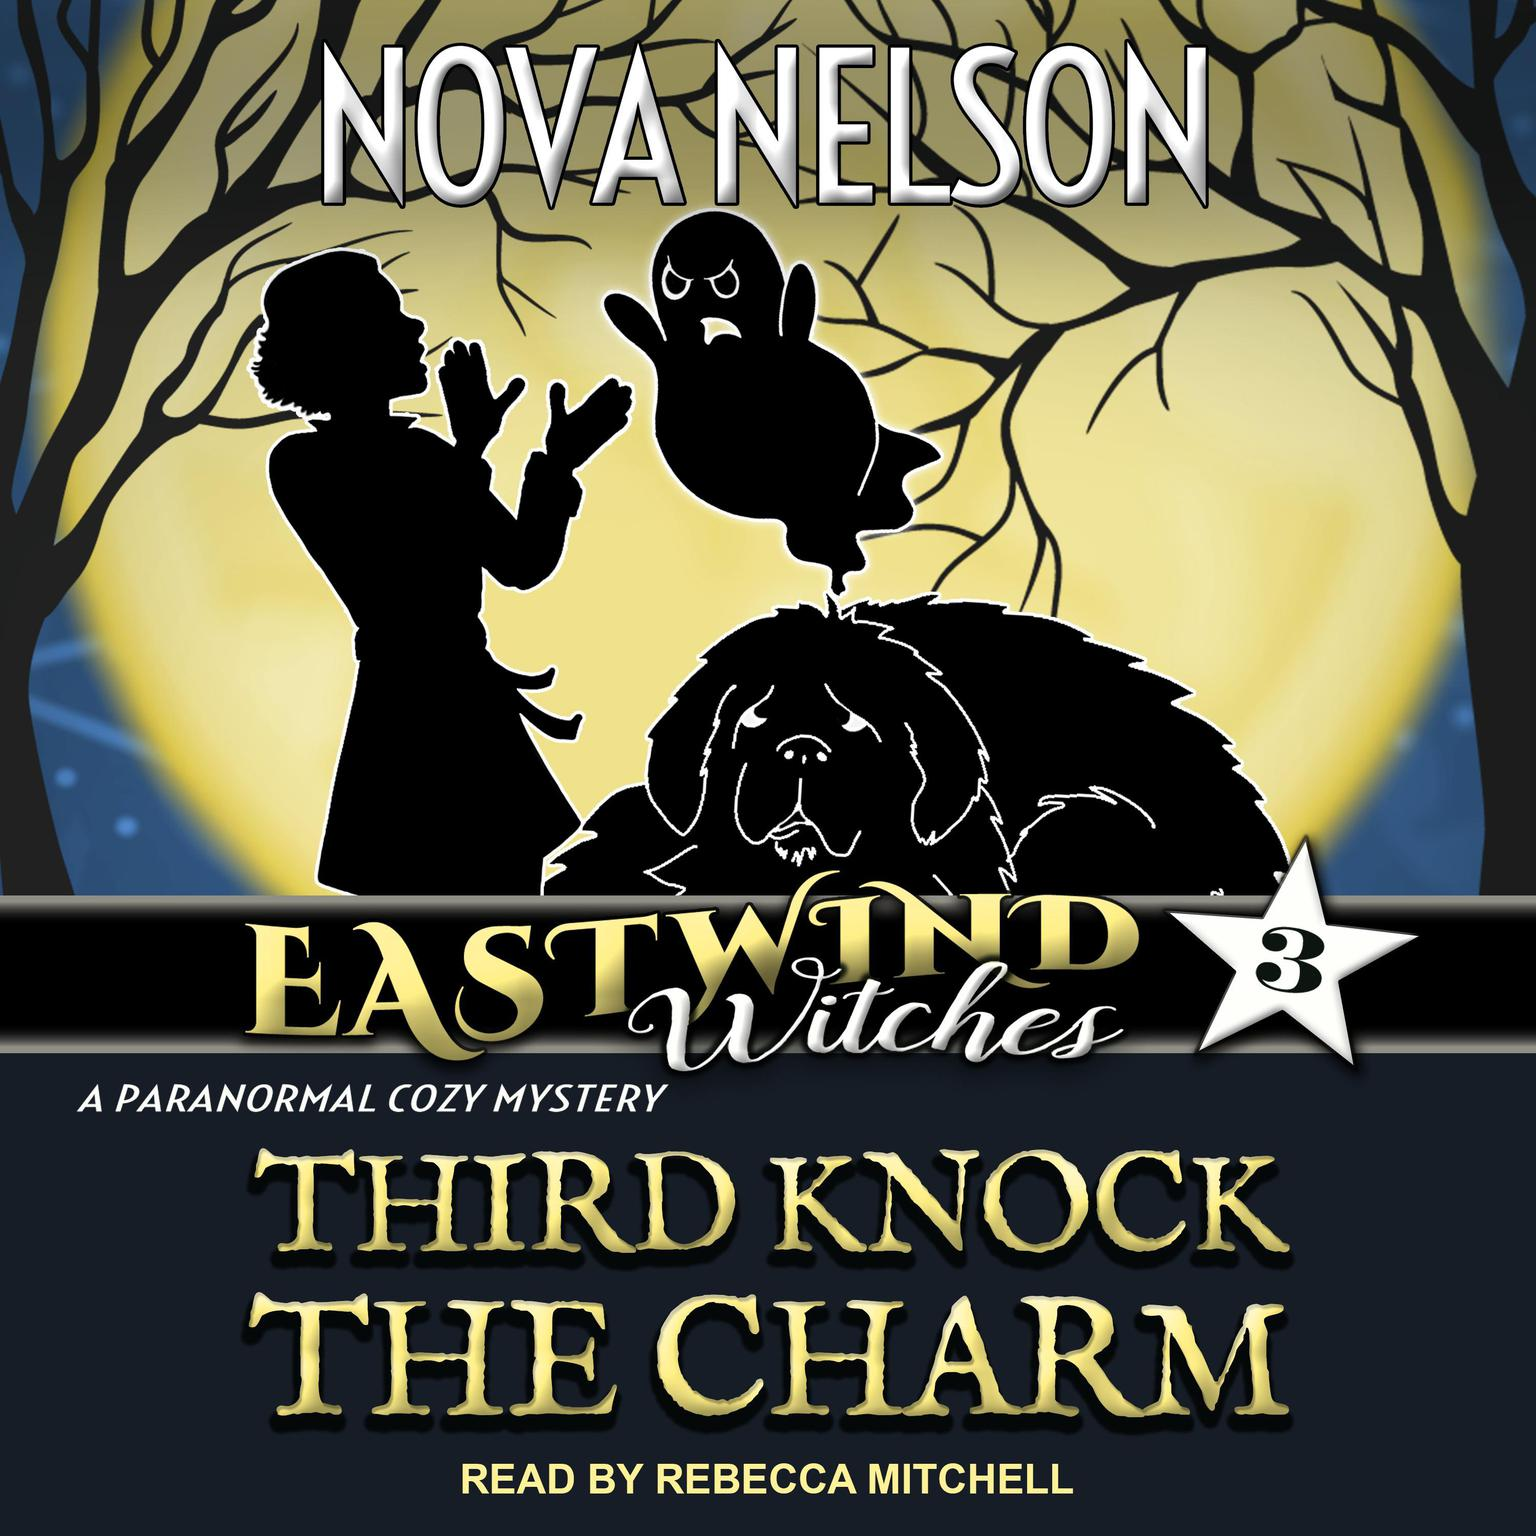 Third Knock the Charm Audiobook, by Nova Nelson